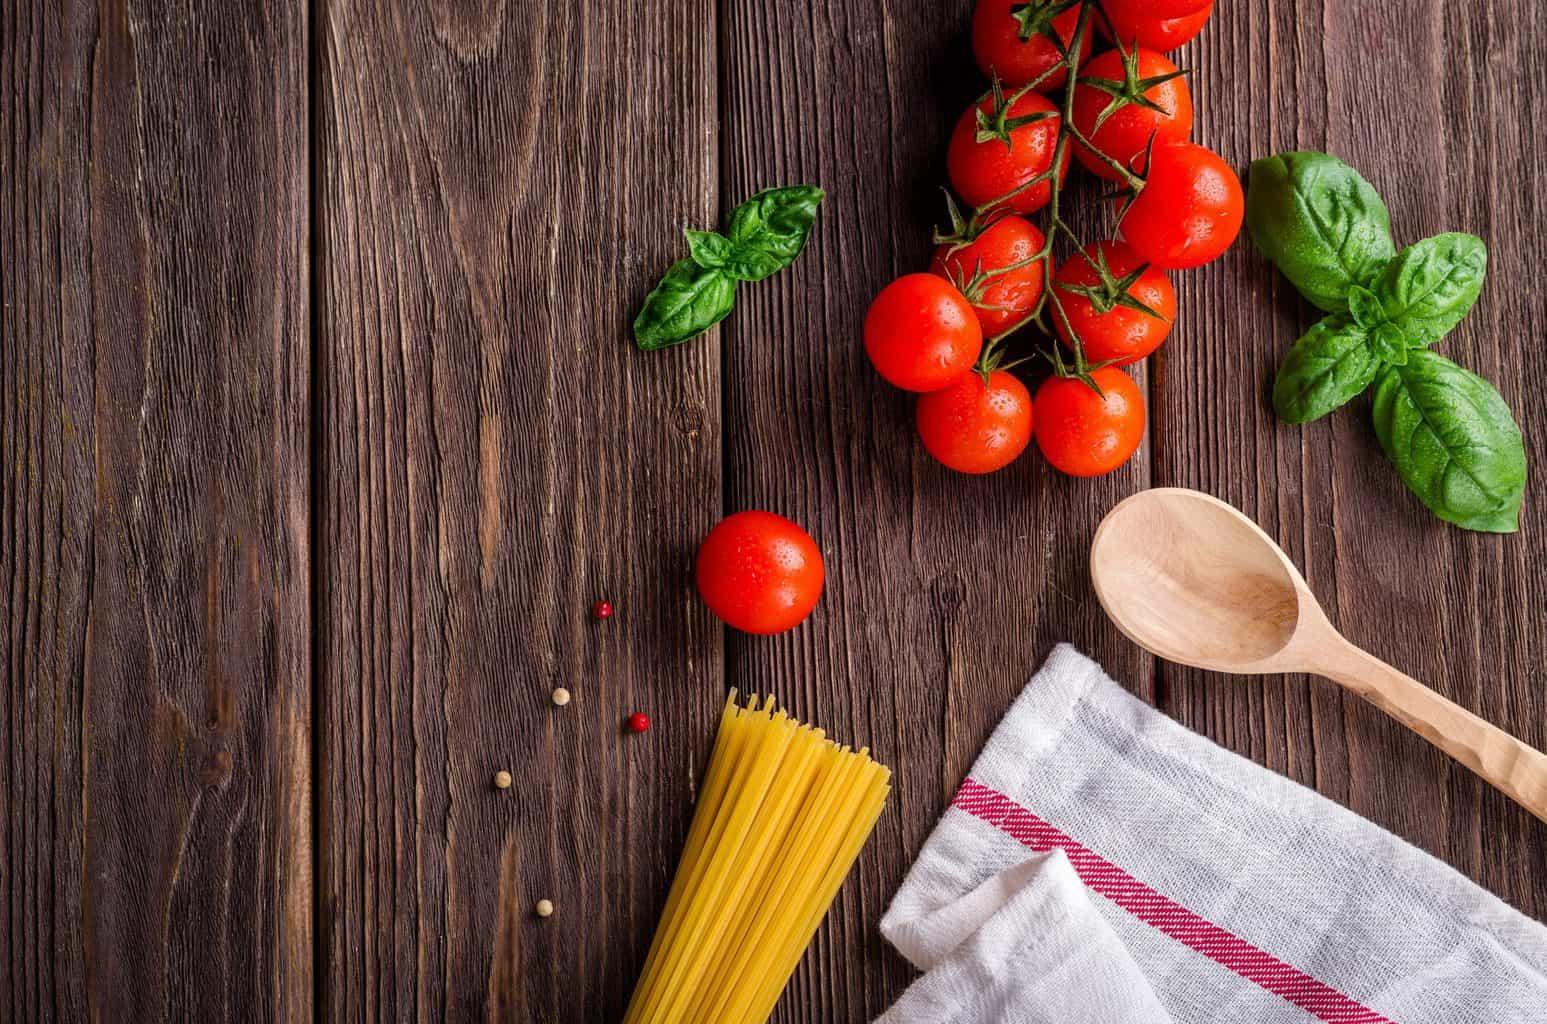 spaghetti, tomatoes, basil